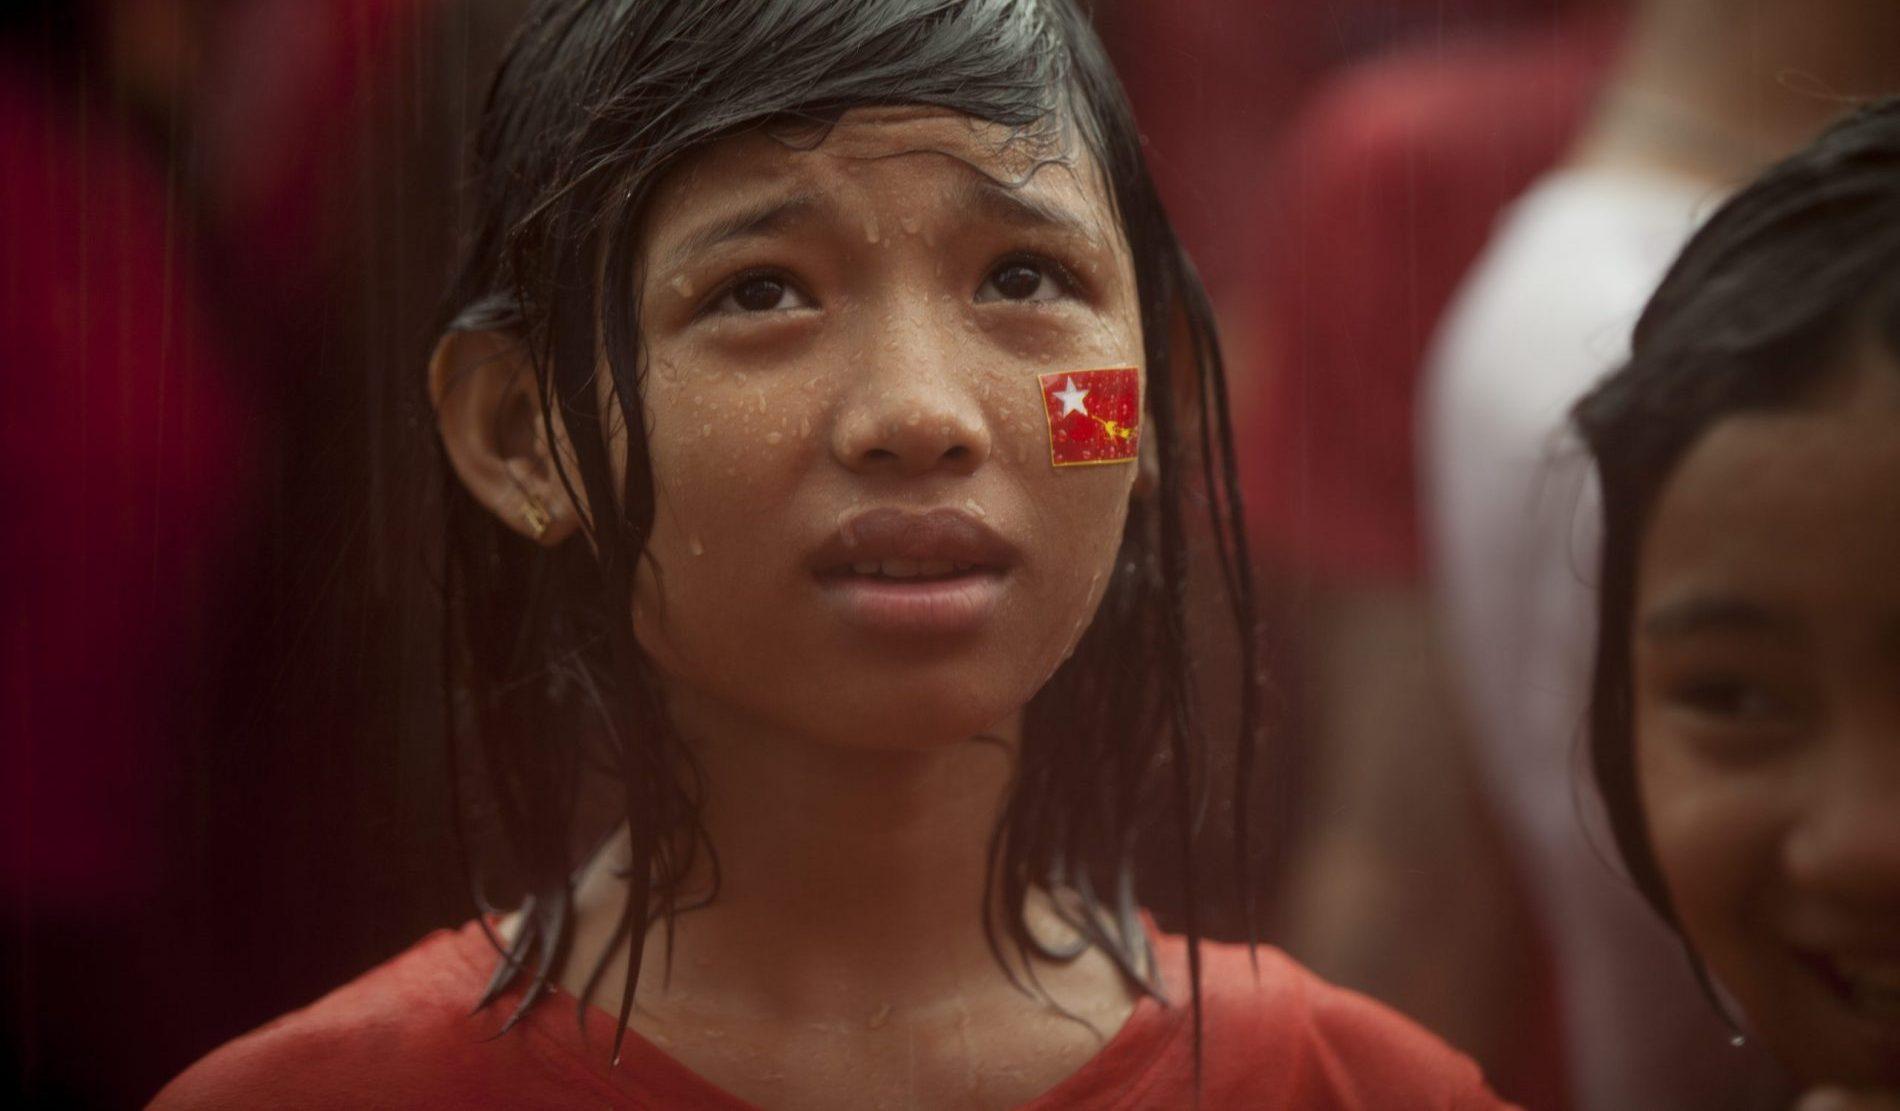 Burma Spring Benefit Film Festival To Debut Online Beginning June 4th